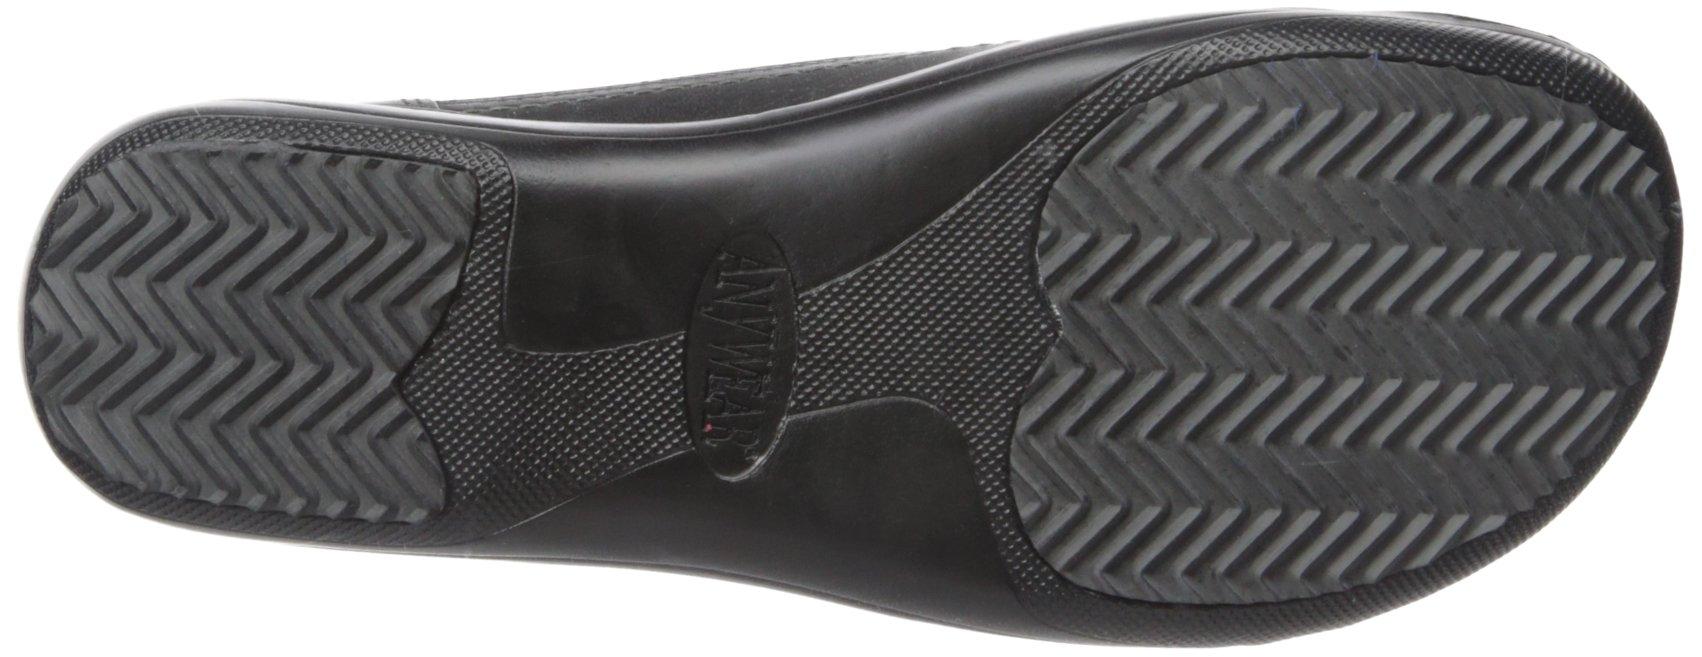 Cherokee Women's Maggie Health Care & Food Service Shoe, Black, 8 M US by Cherokee (Image #3)